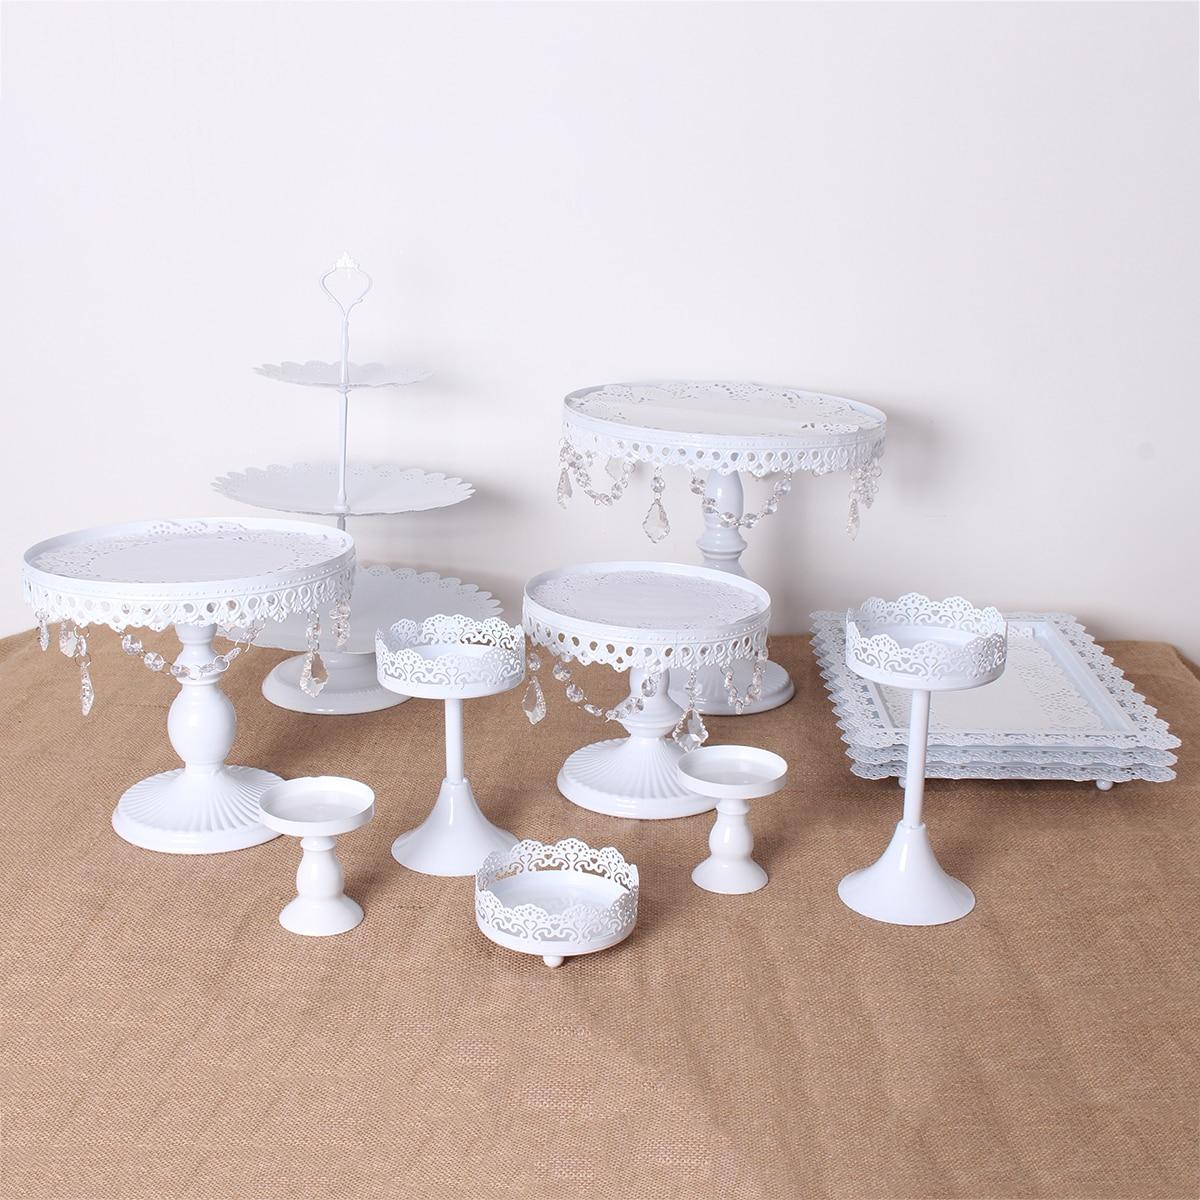 White Gold 12pcs Crystal Metal Cake Stand Set Holder Cupcake Stand